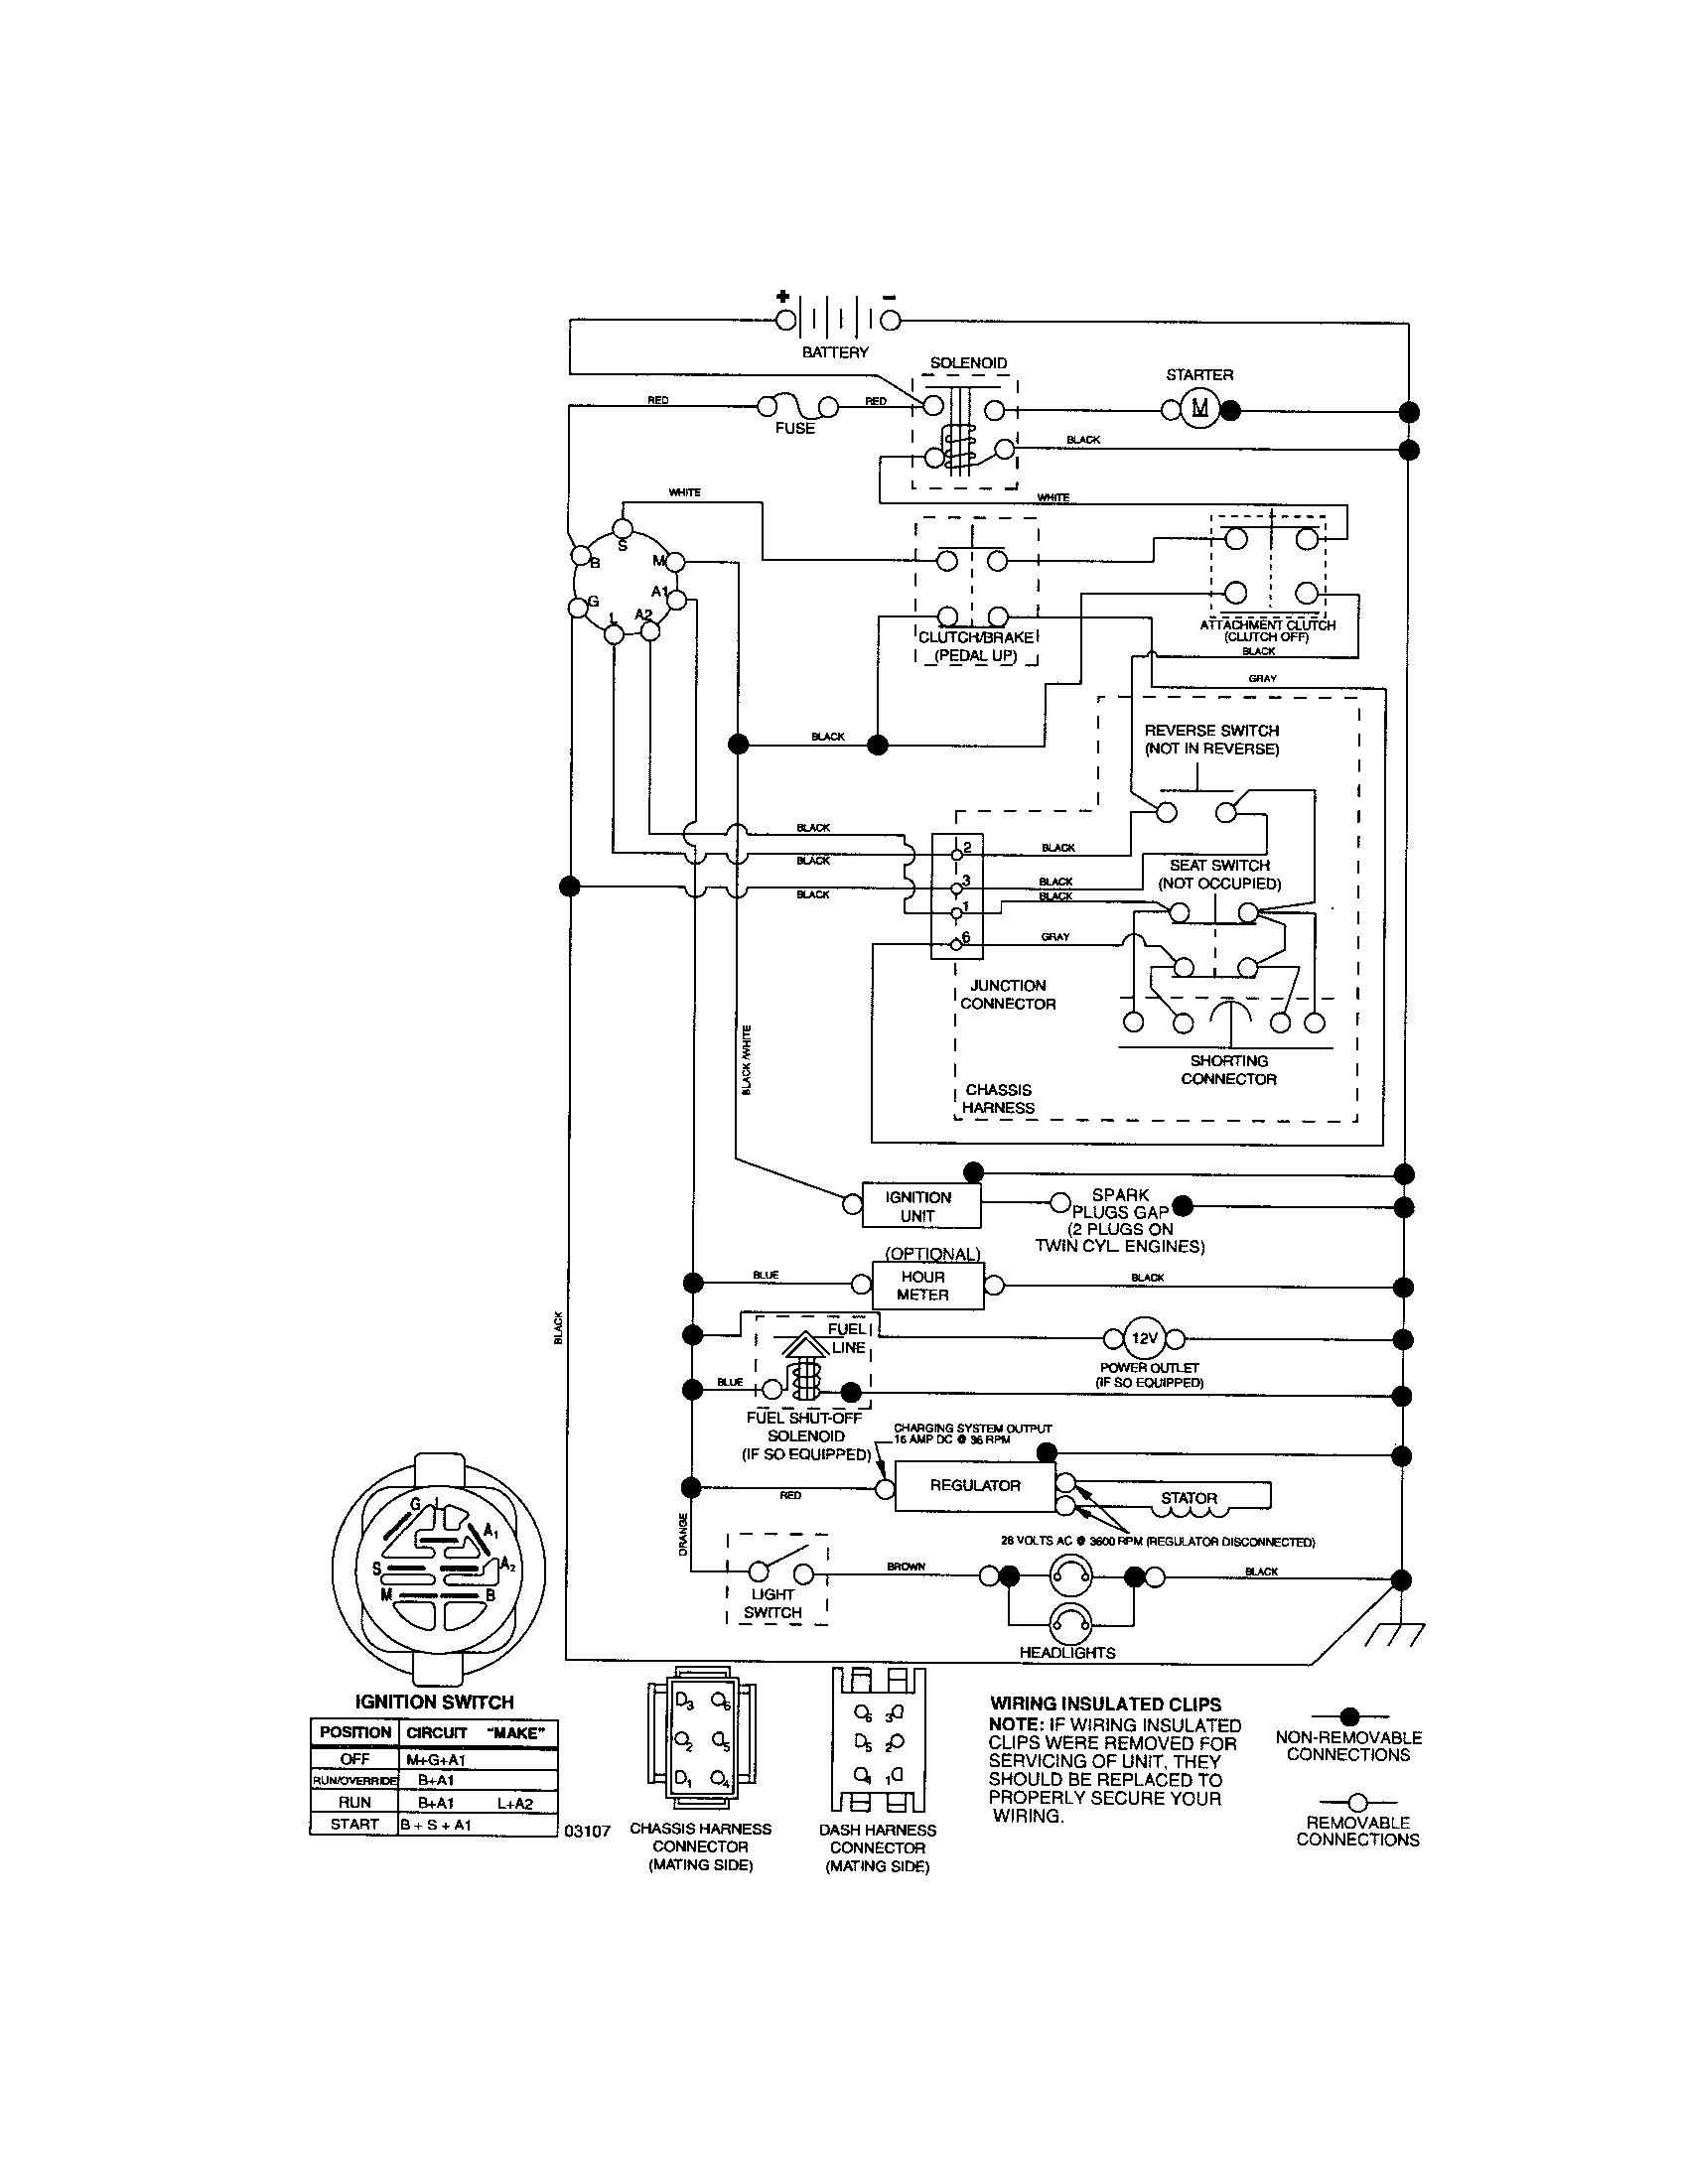 Kohler Engine Electrical Diagram Craftsman 917 270930 Wiring Diagram I Colored A Few Wires To Mak Engineering Craftsman Riding Lawn Mower Electrical Diagram